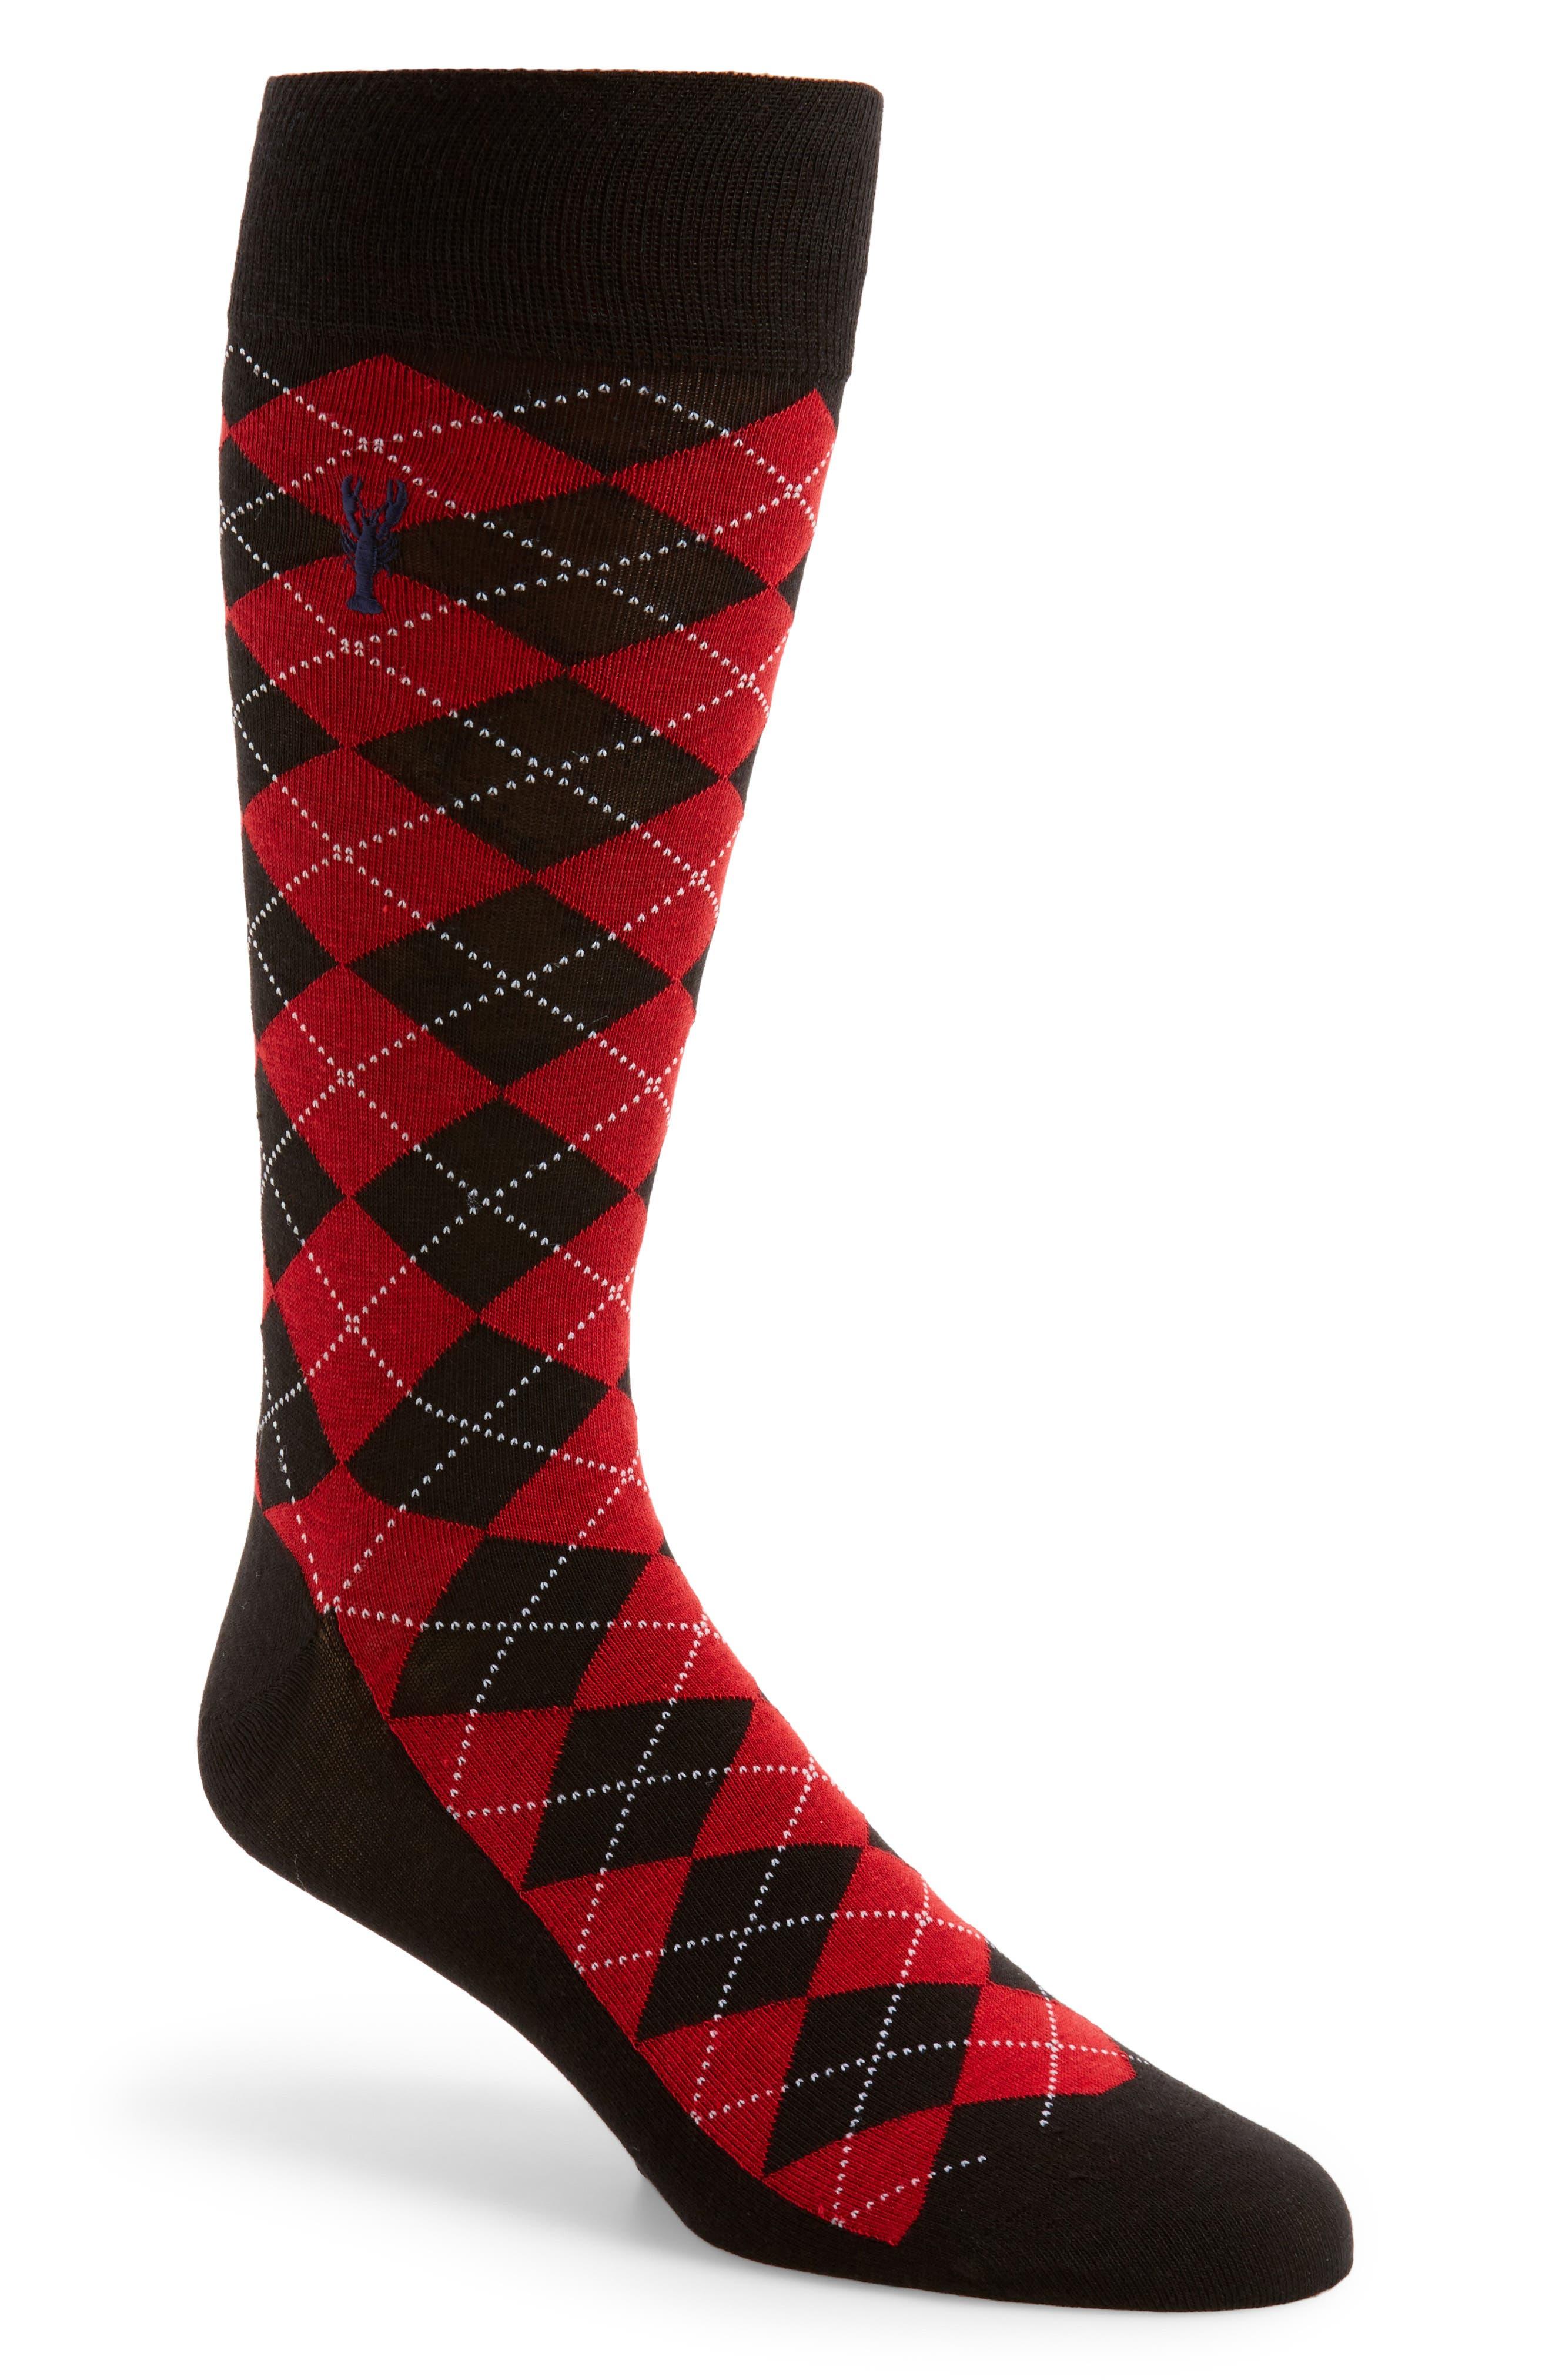 Pinch Argyle Socks,                             Main thumbnail 1, color,                             003